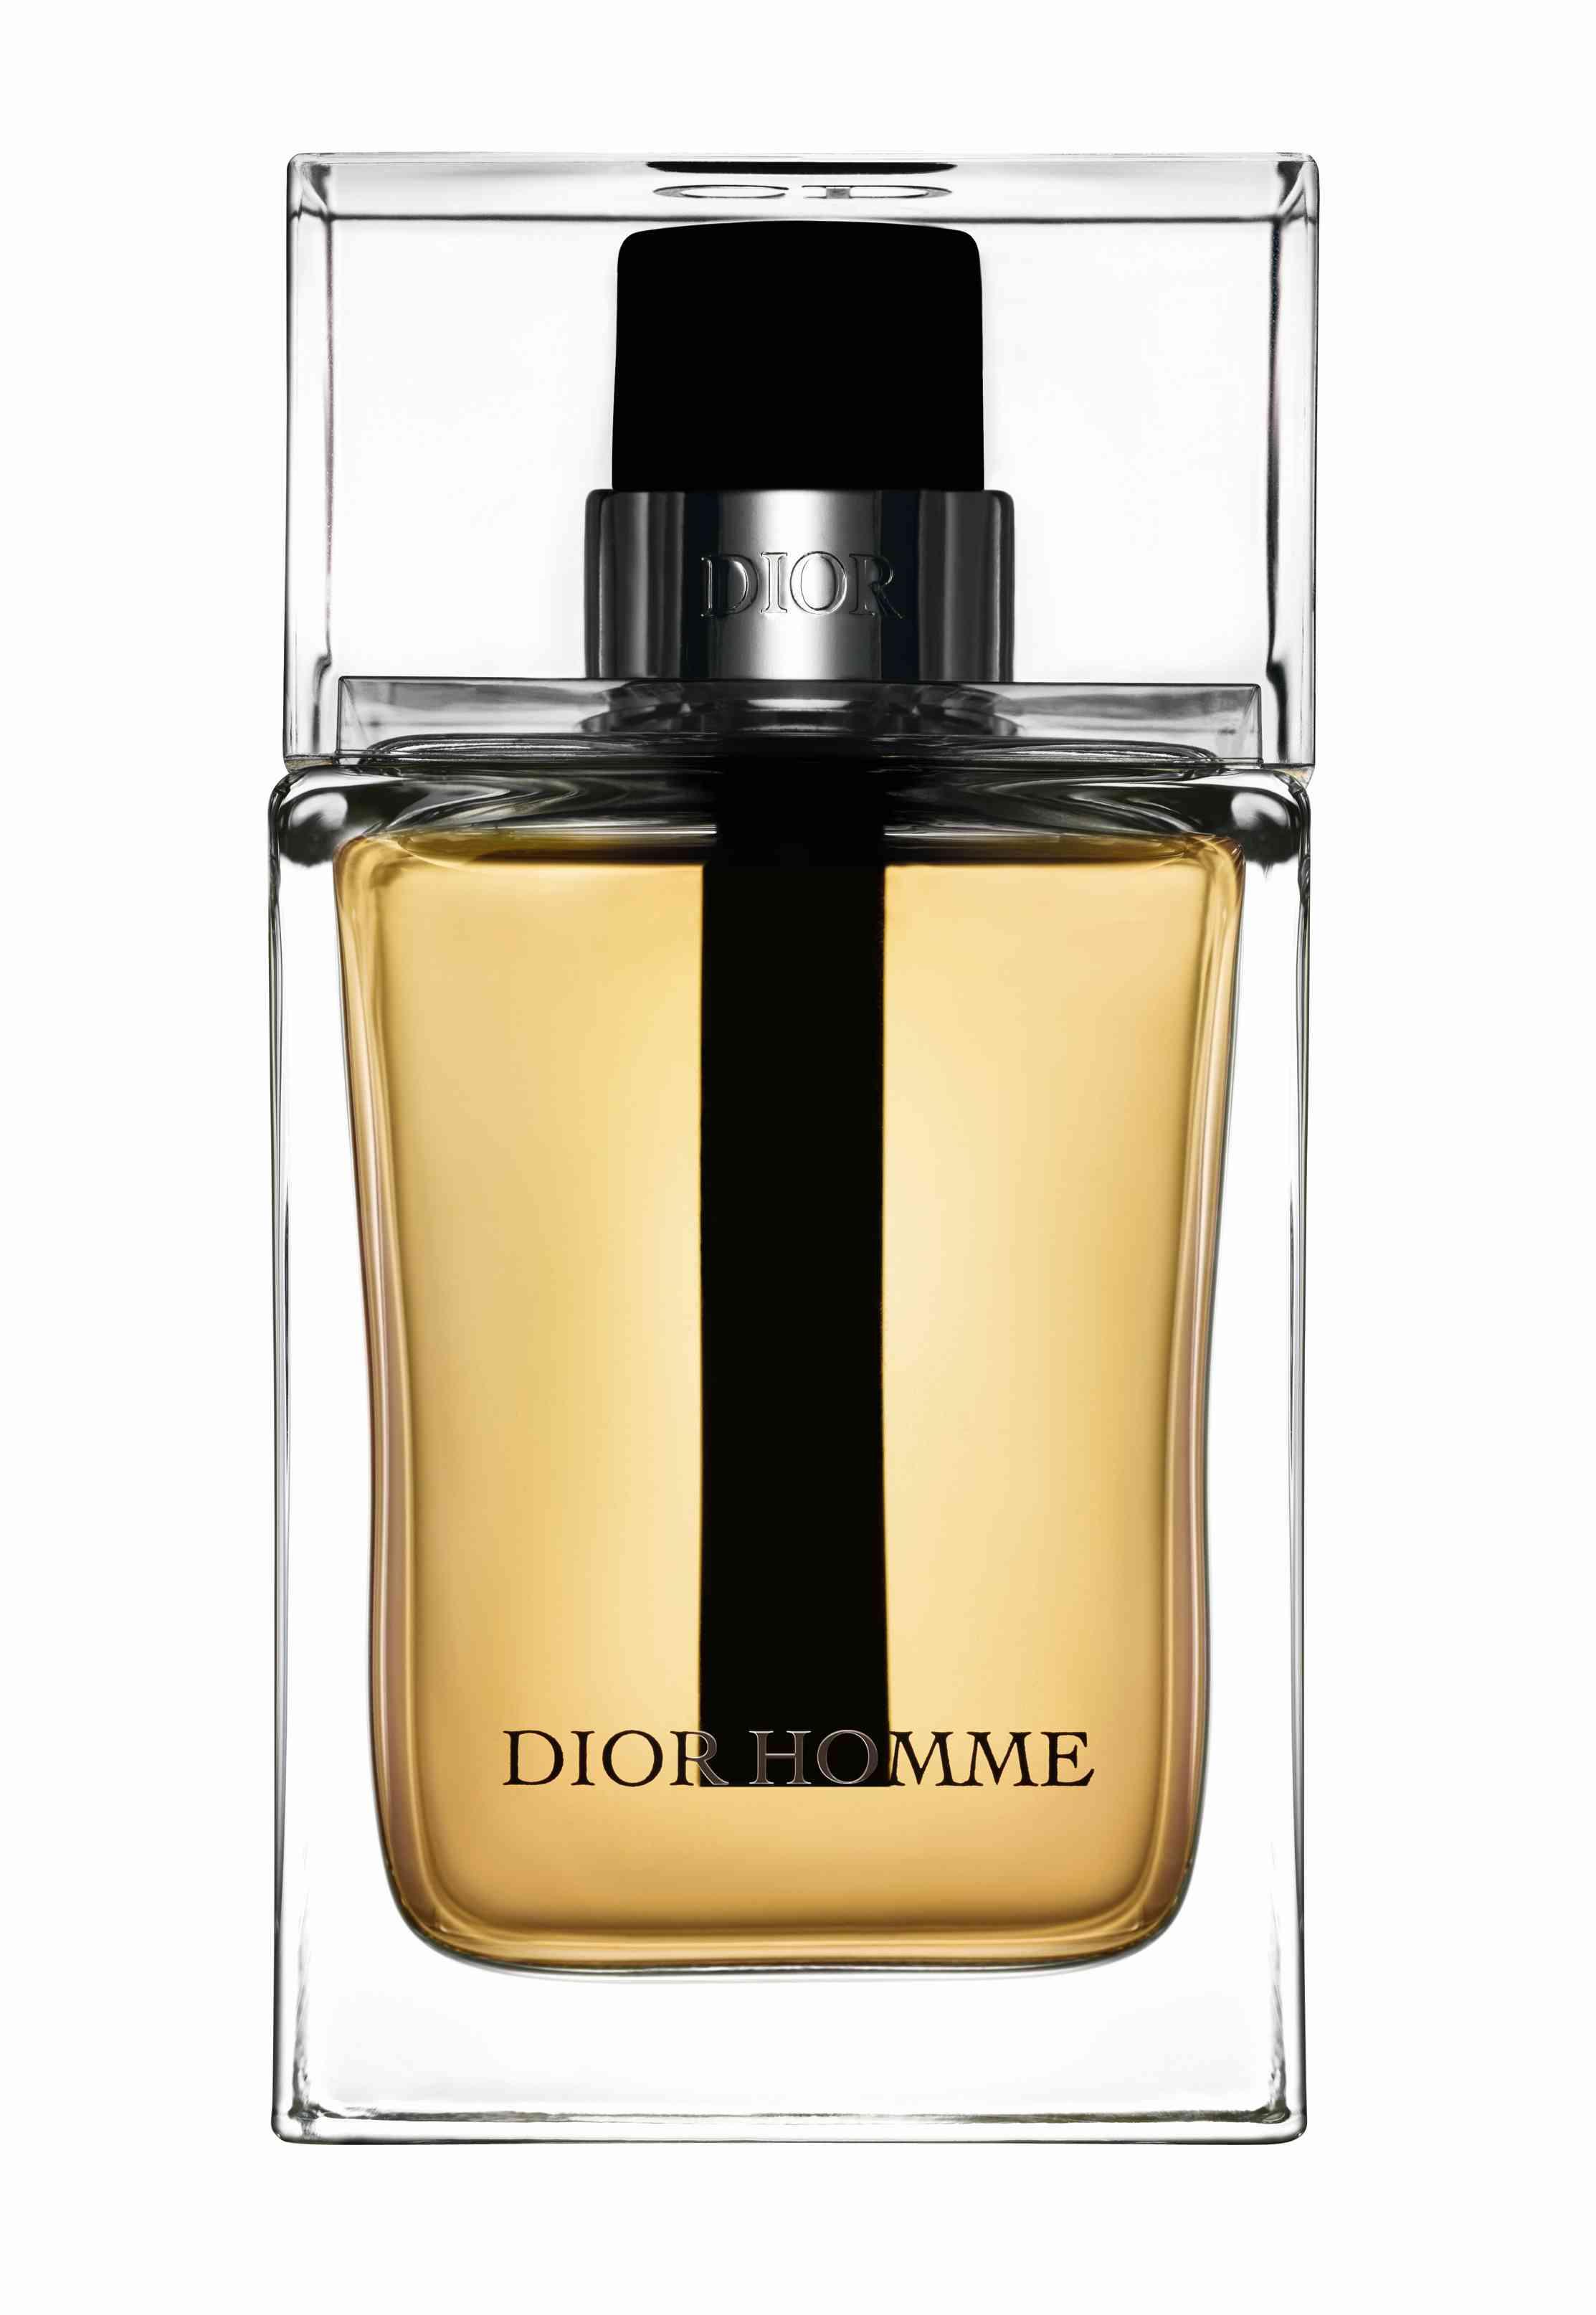 Dior Pour Homme - www.gentlemansbutler.com